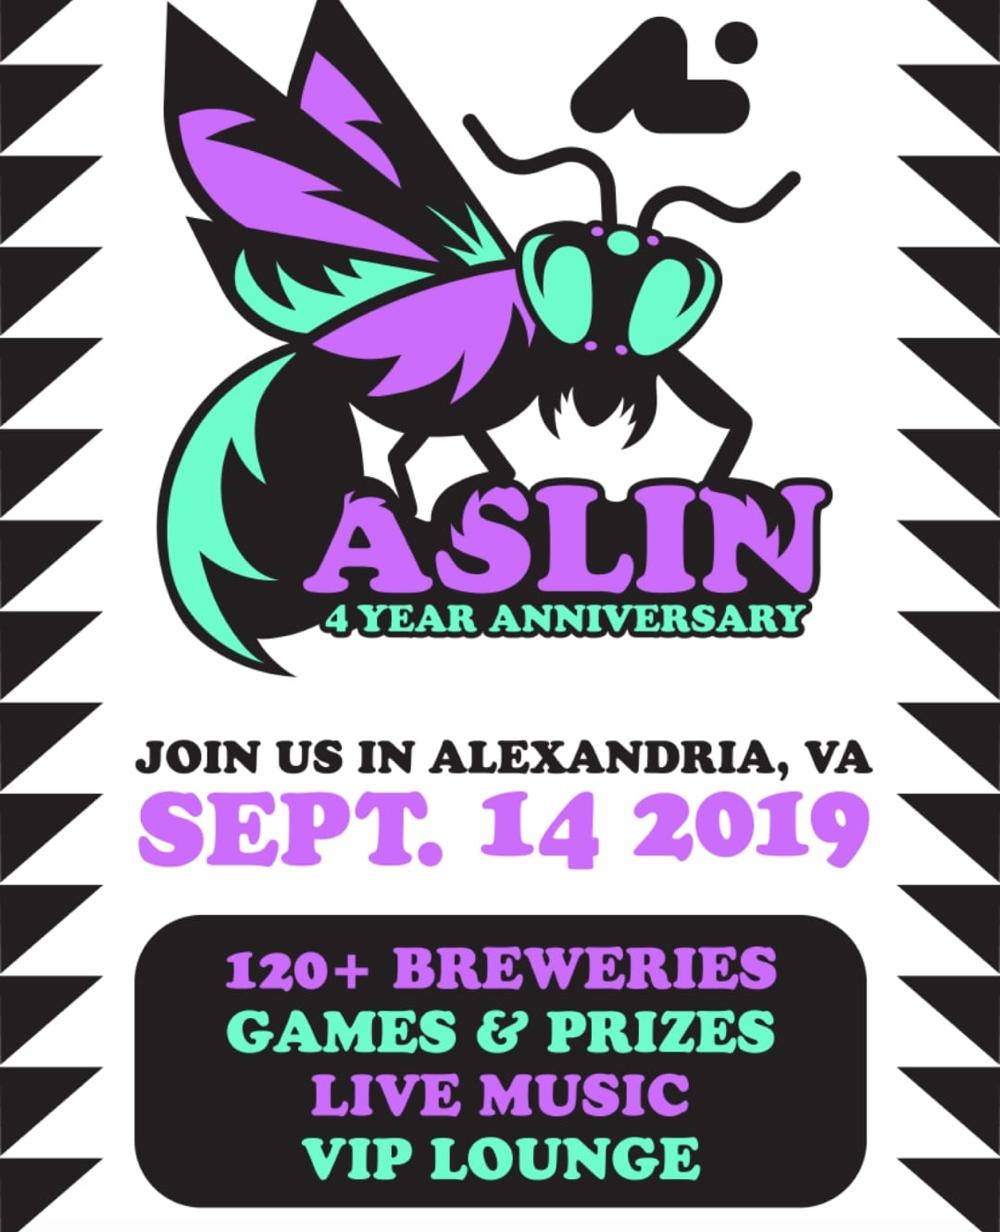 Aslin 4 Year Anniversary flyer